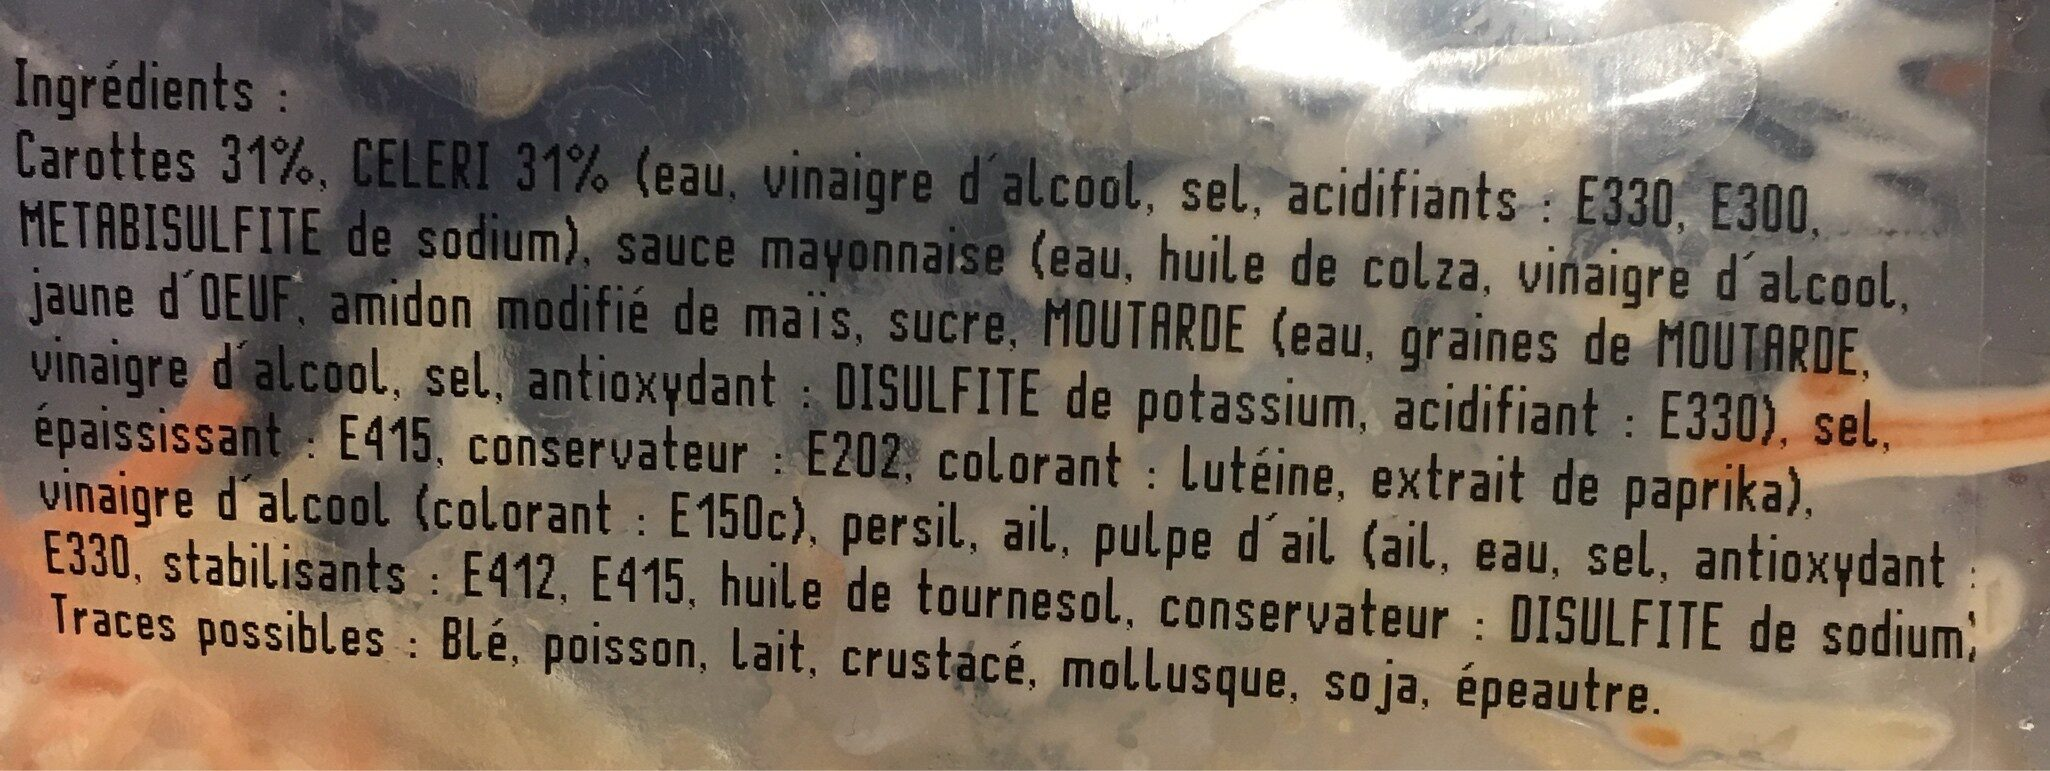 Salade duo de carotte et celerie - Ingrediënten - fr